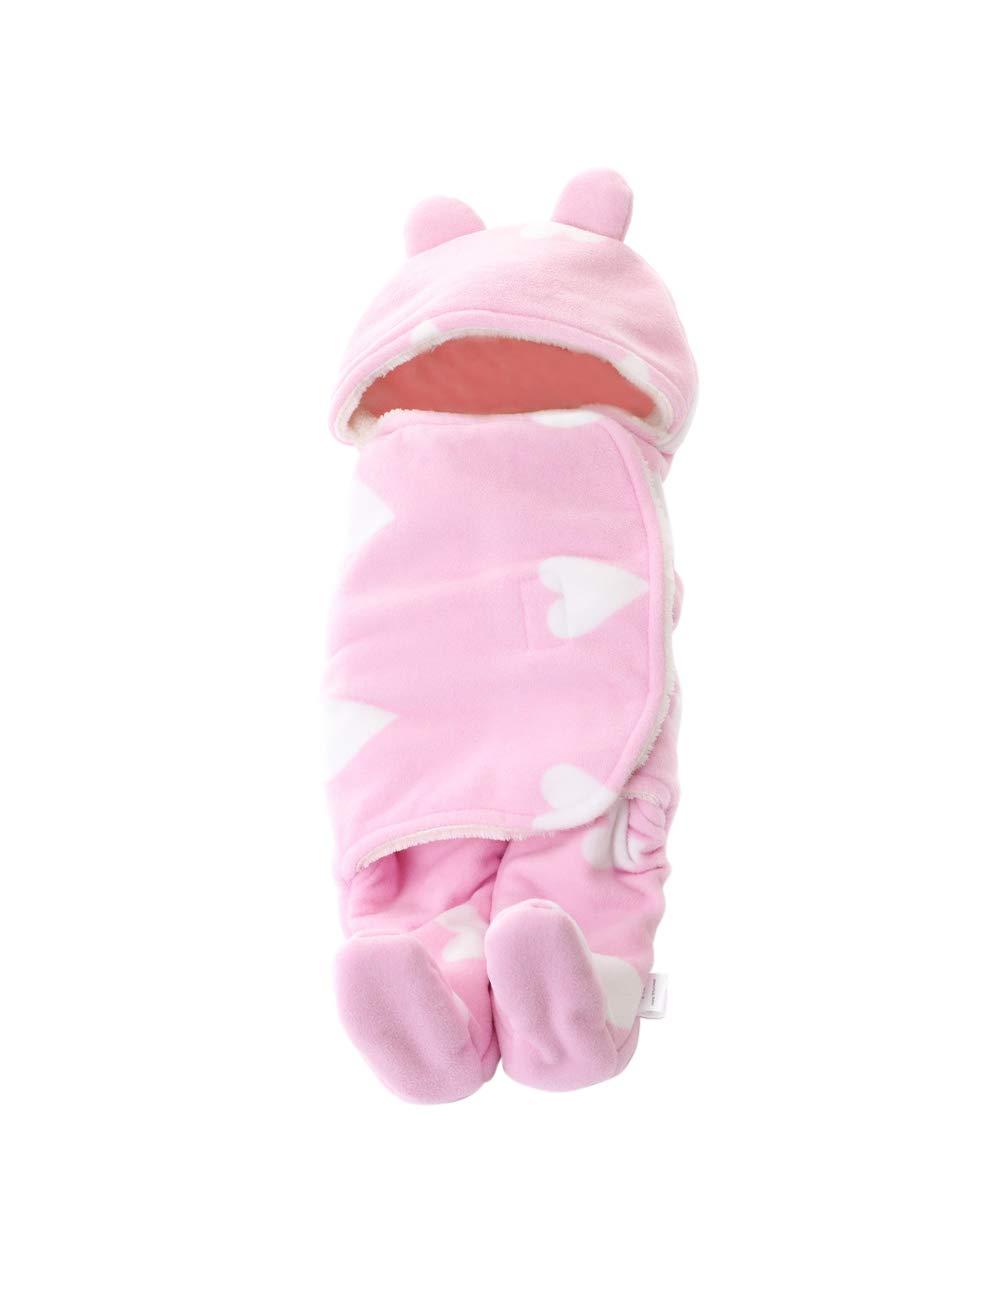 Baby Blanket Newborn Swaddle Wrap Warm Sleeping Bag Stroller Sleepsacks Zhhmeiruian